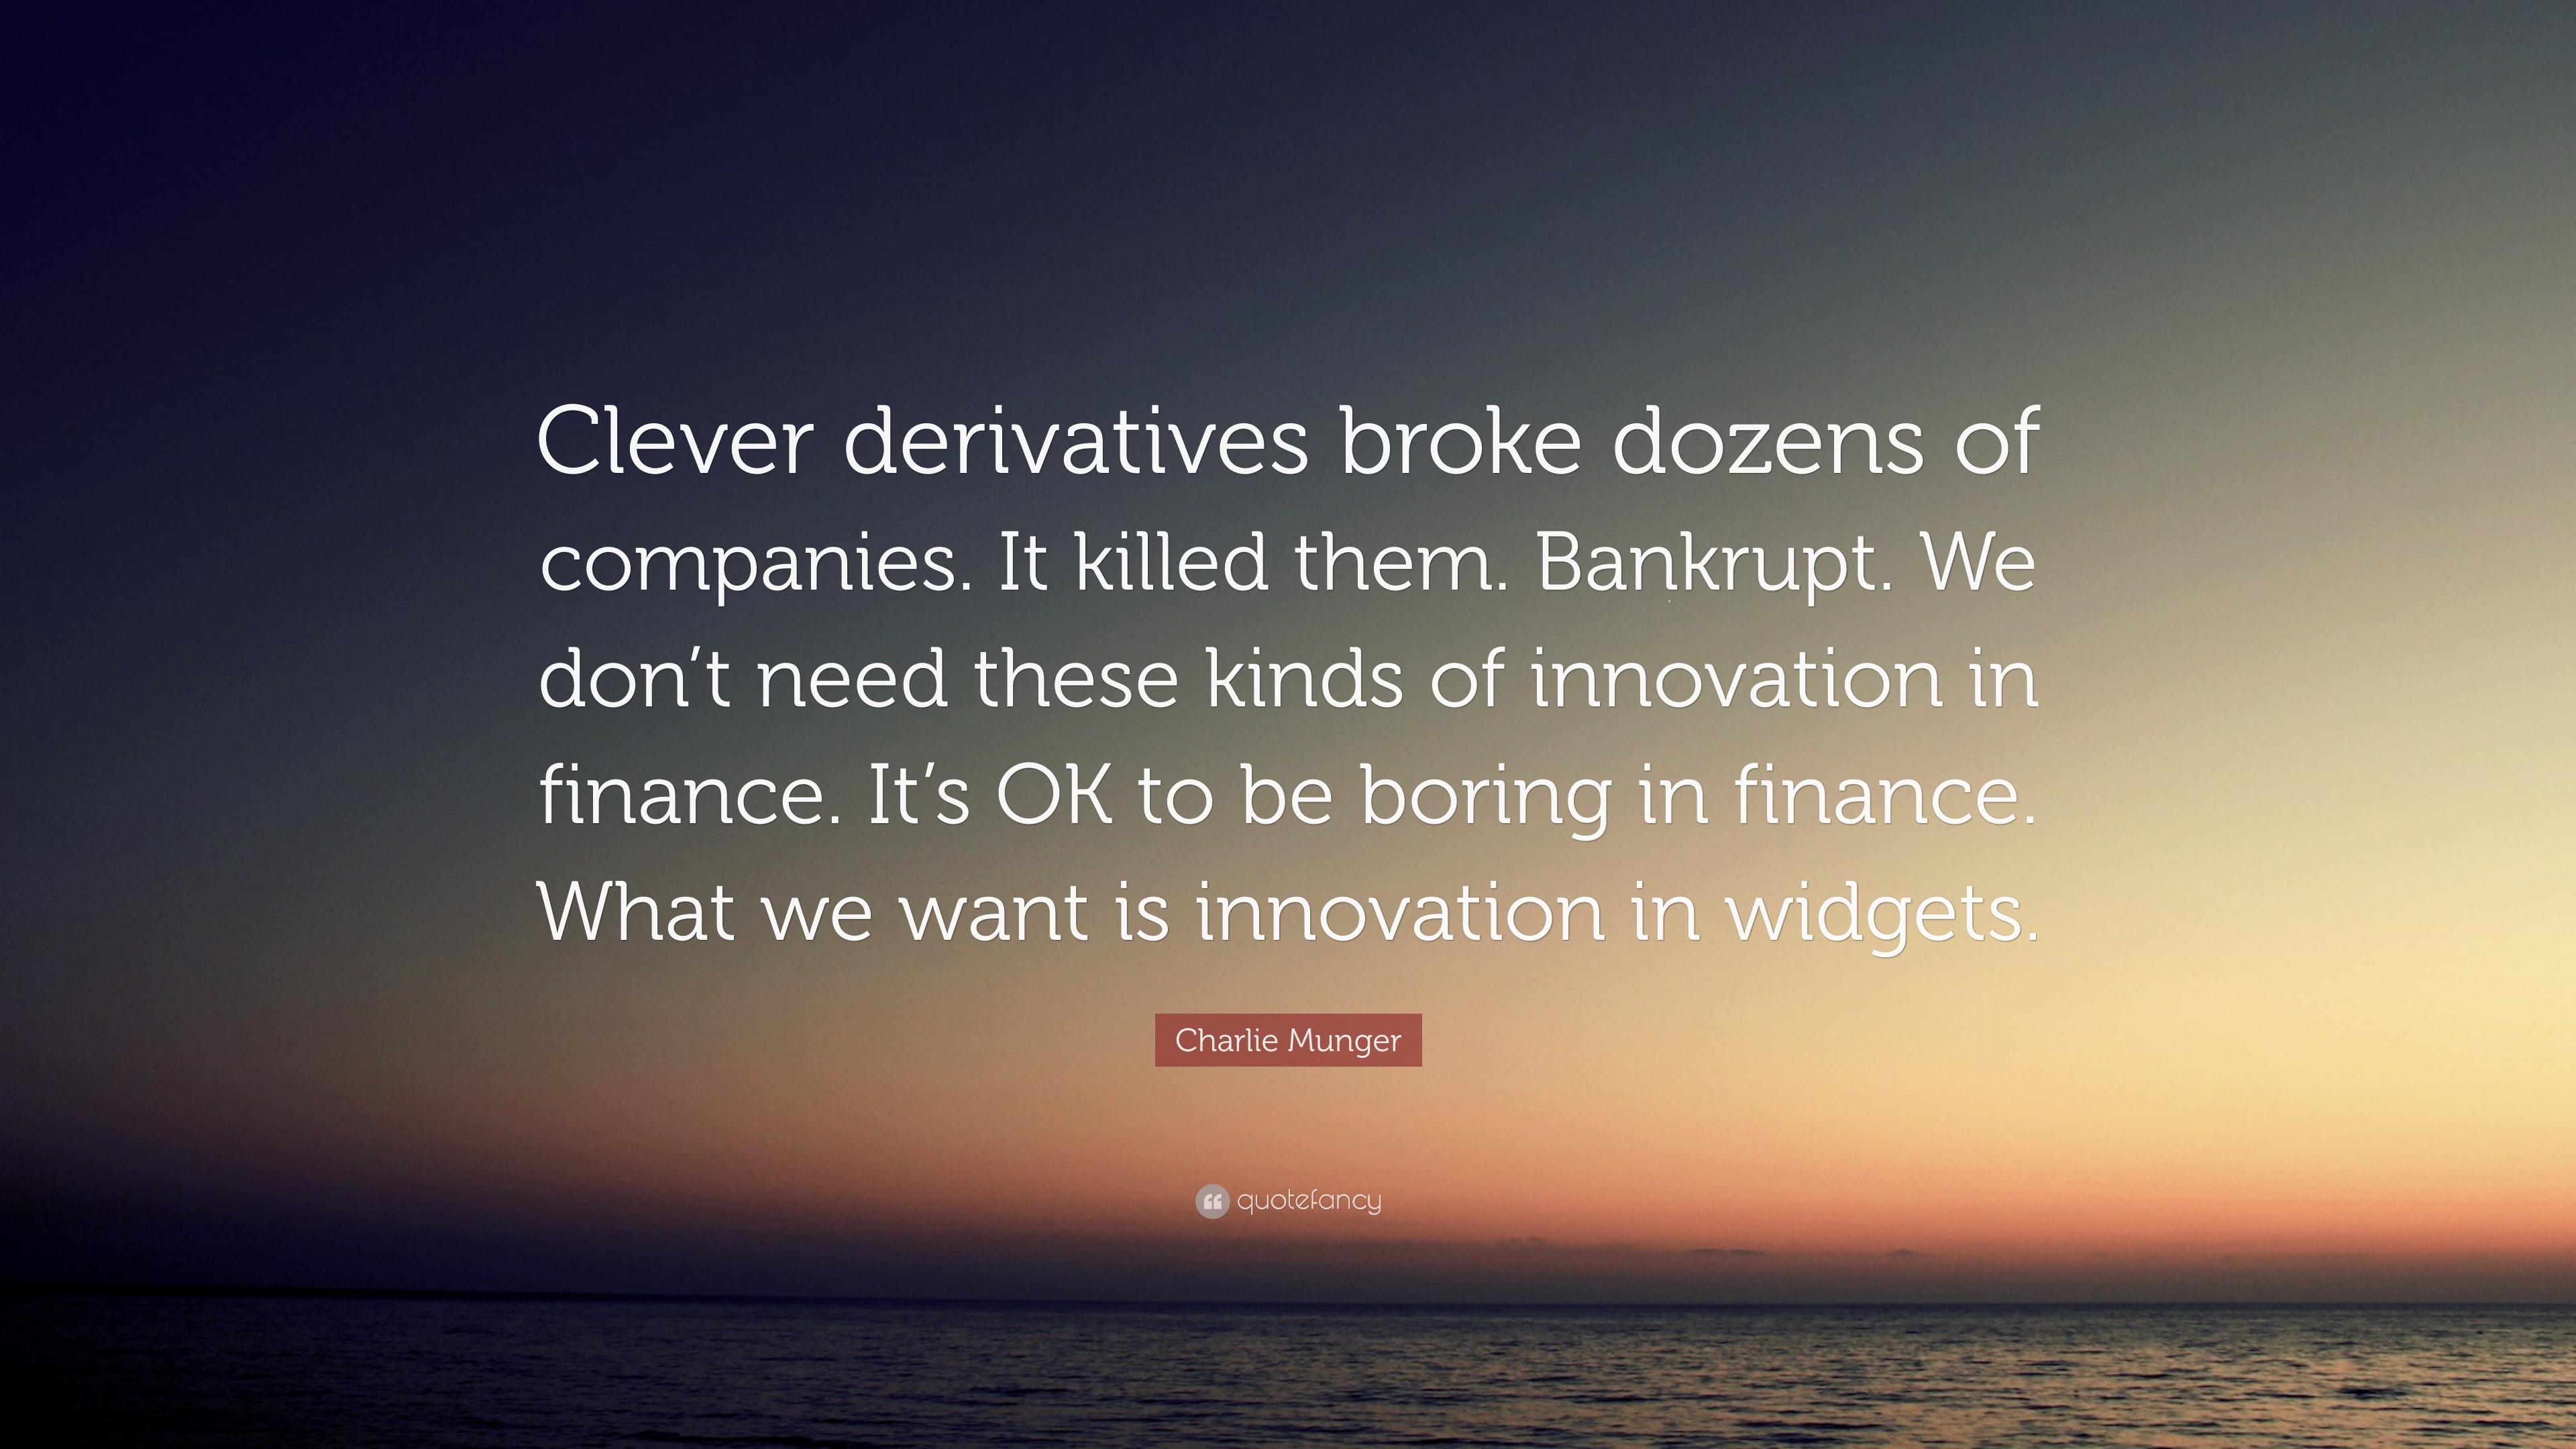 Charlie munger quote clever derivatives broke dozens of charlie munger quote clever derivatives broke dozens of companies it killed them altavistaventures Choice Image